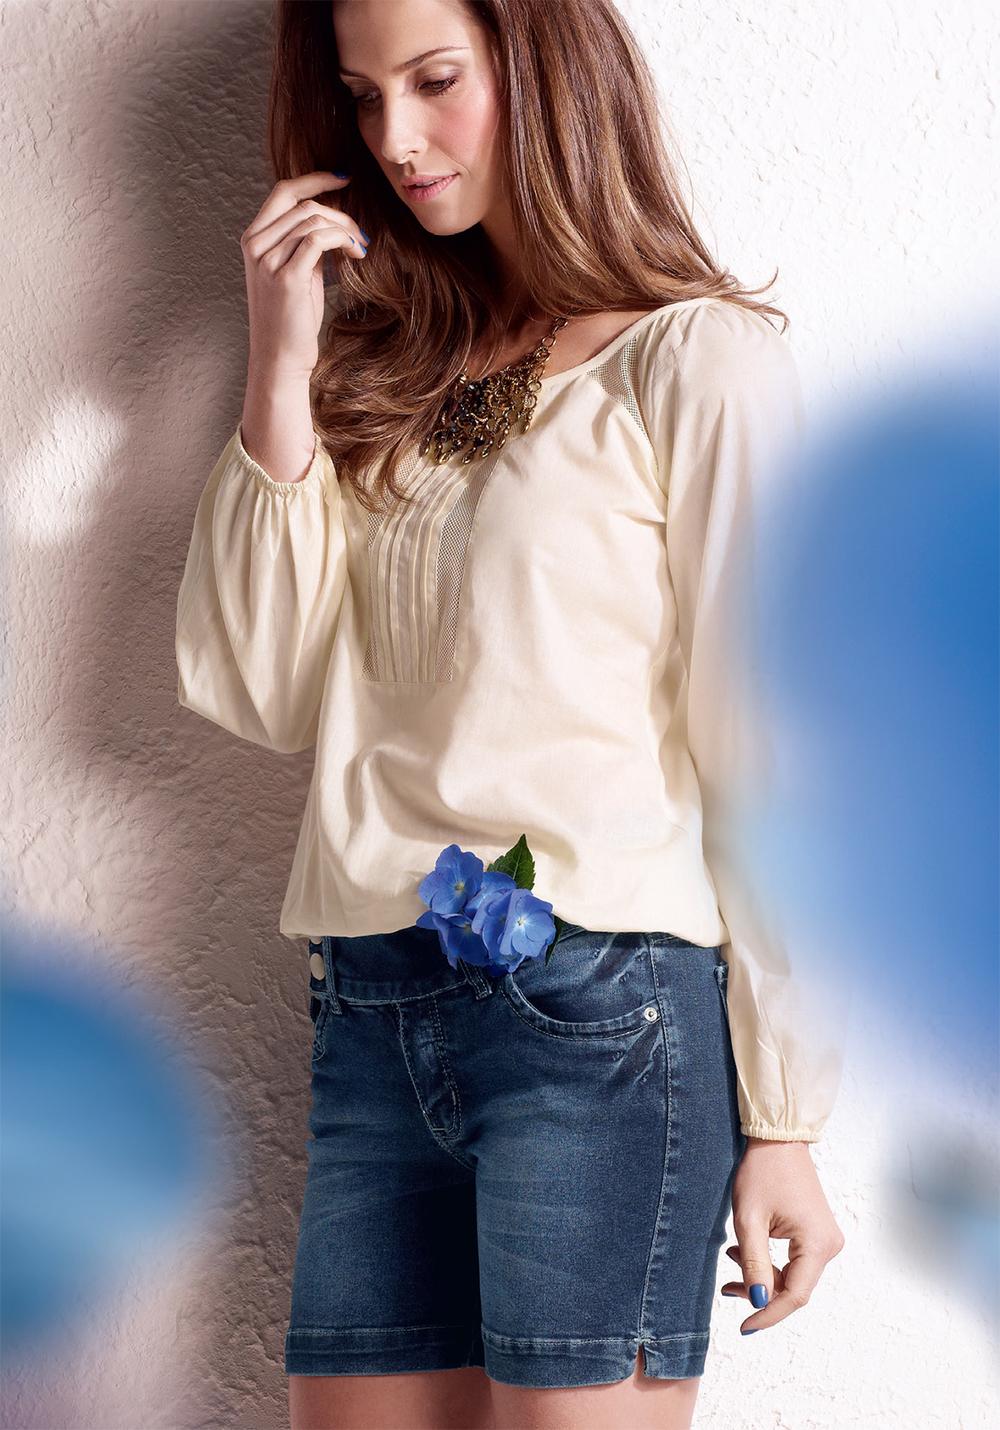 LOOK_BOOK_02 jeans 11x17 final (alta)-19 copy.jpg